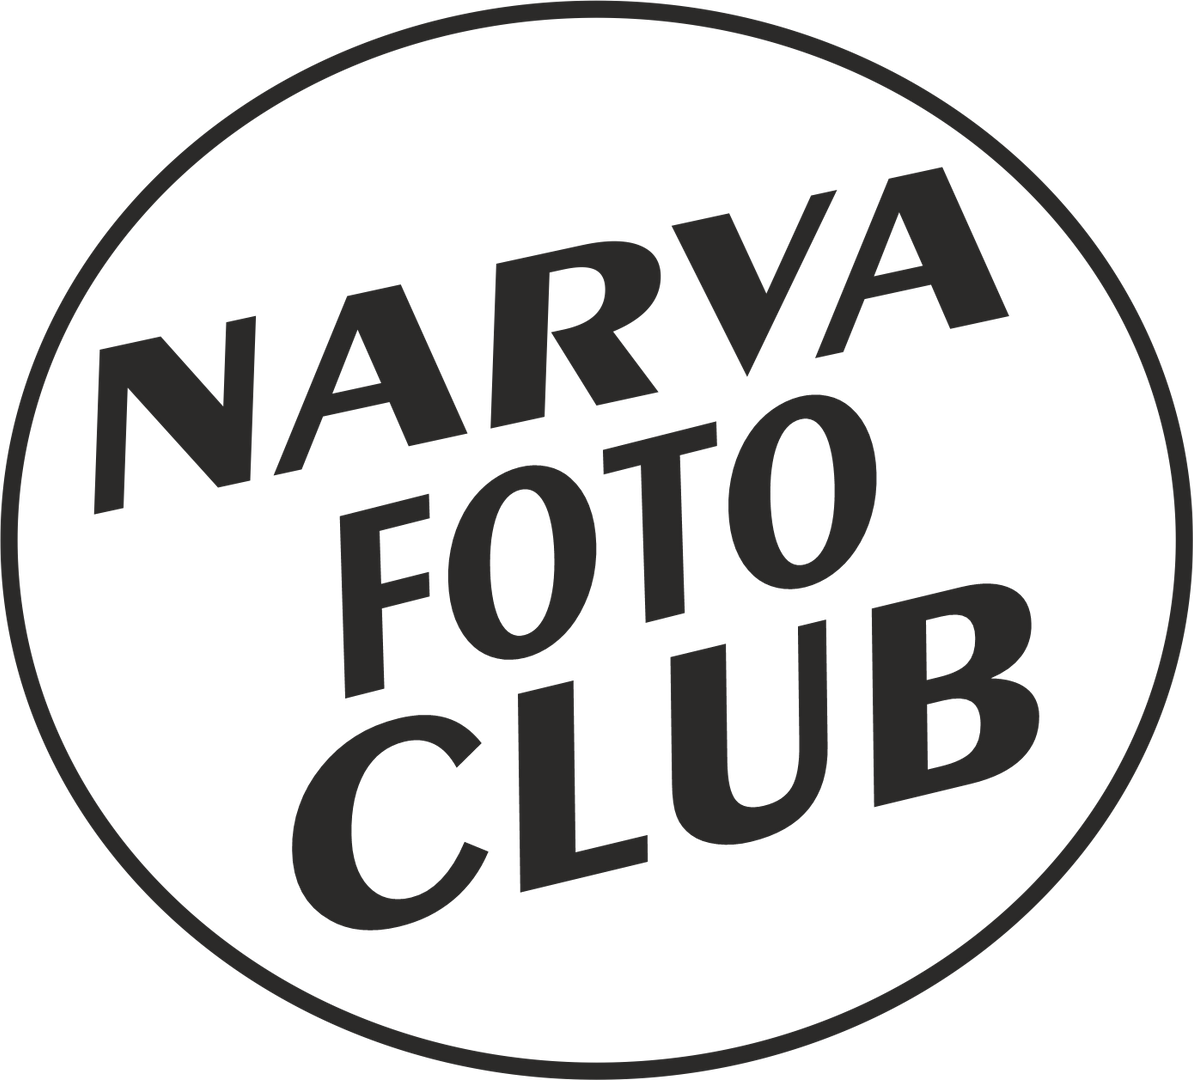 fotoclub2.png